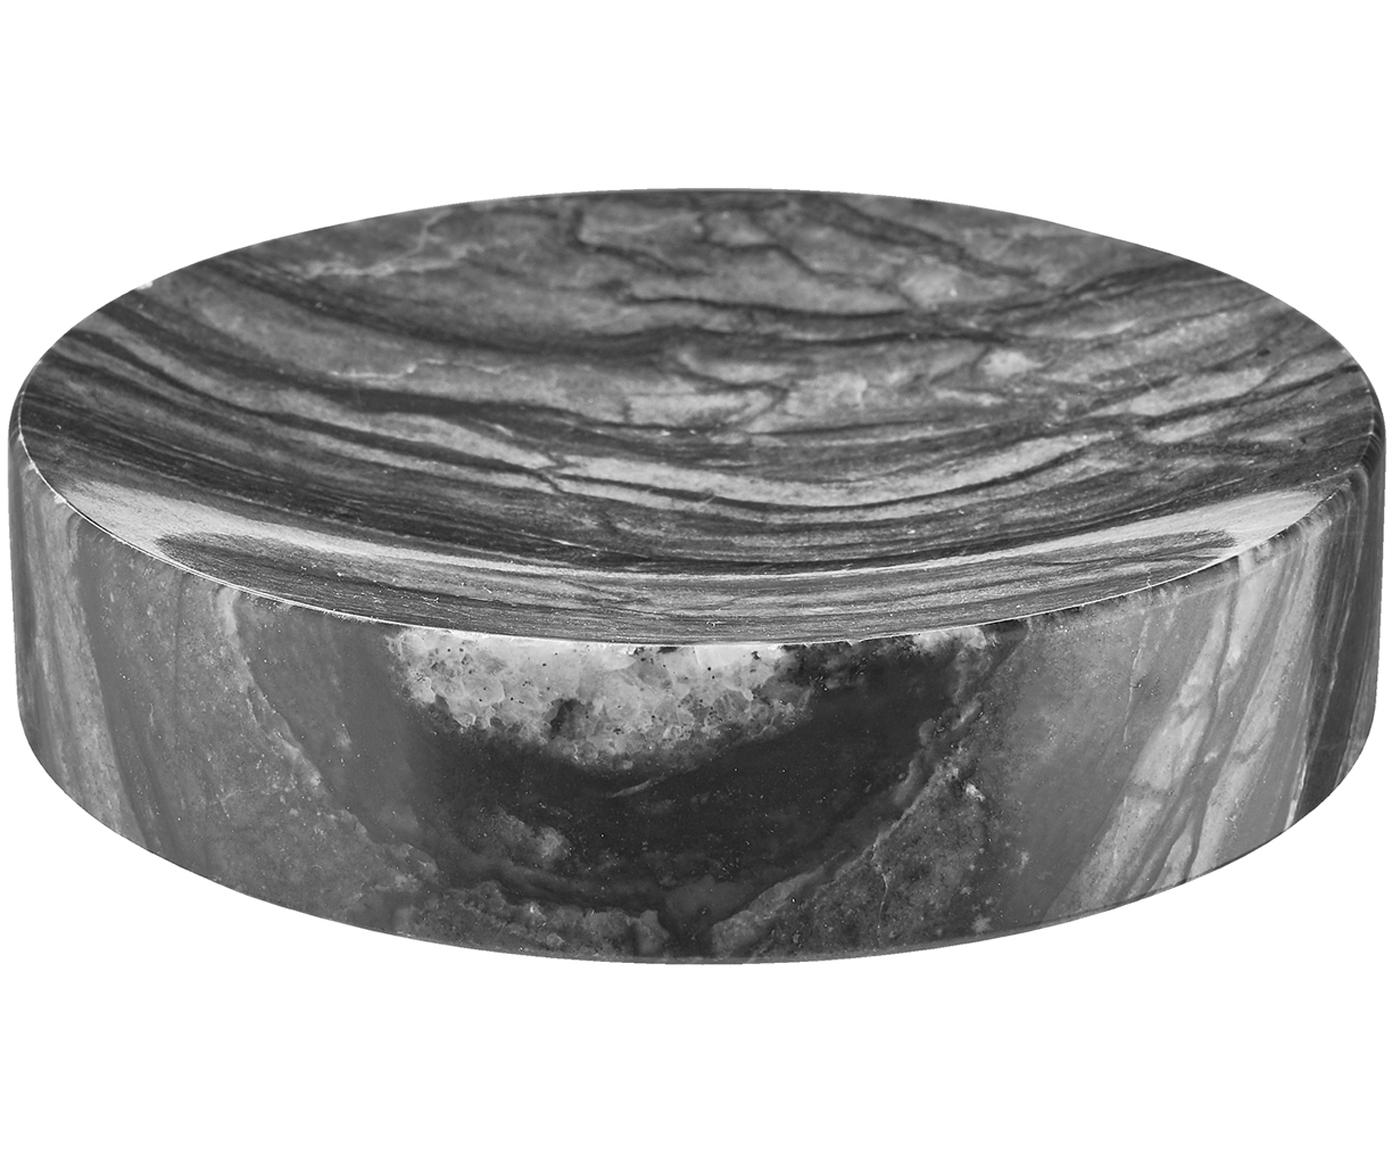 Zeepbakje Teren, Marmer, Zwart, Ø 11 x H 3 cm